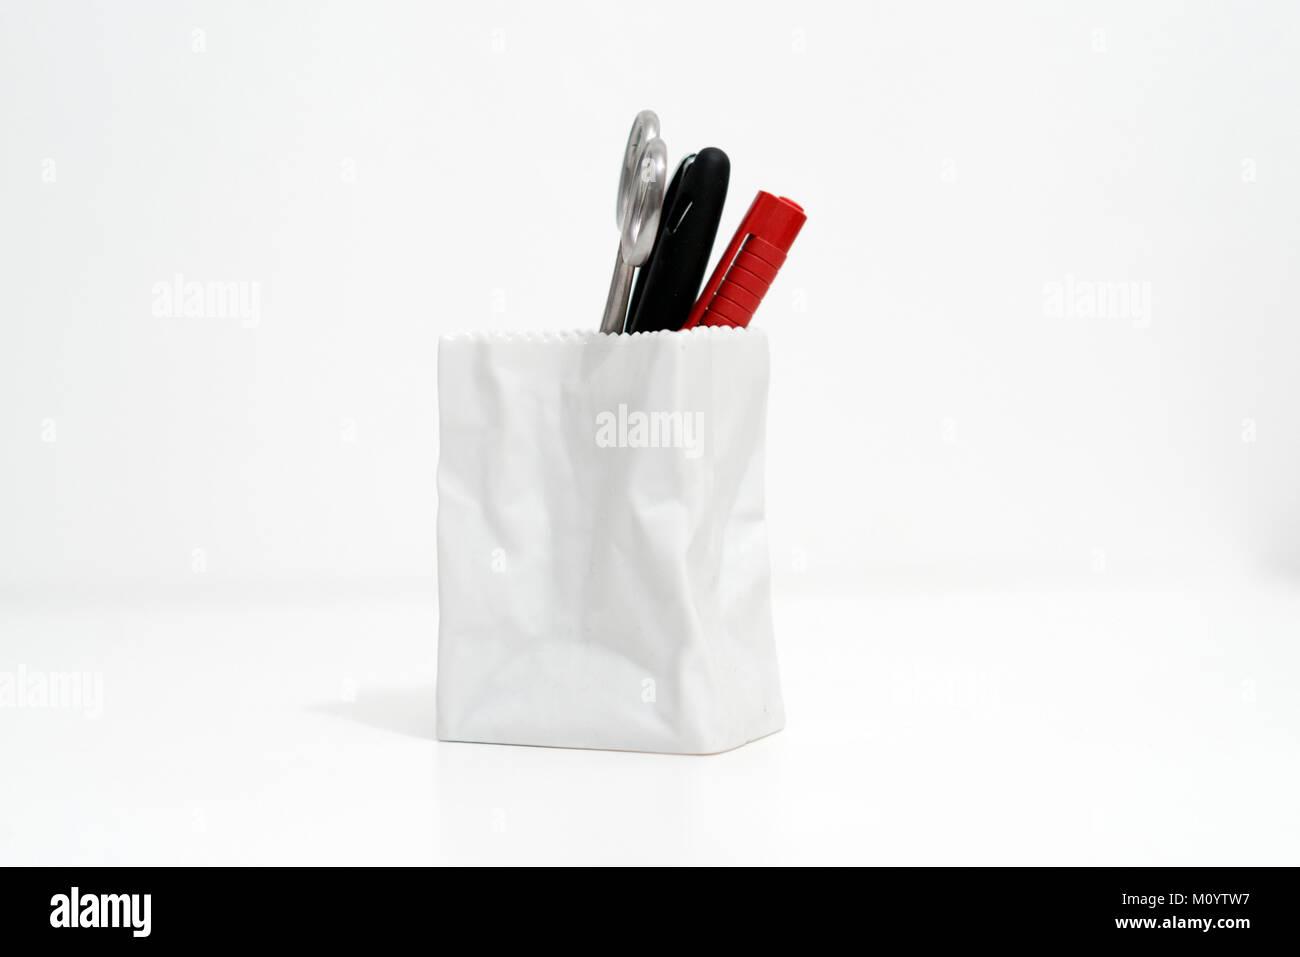 Pen holder minimal - Stock Image